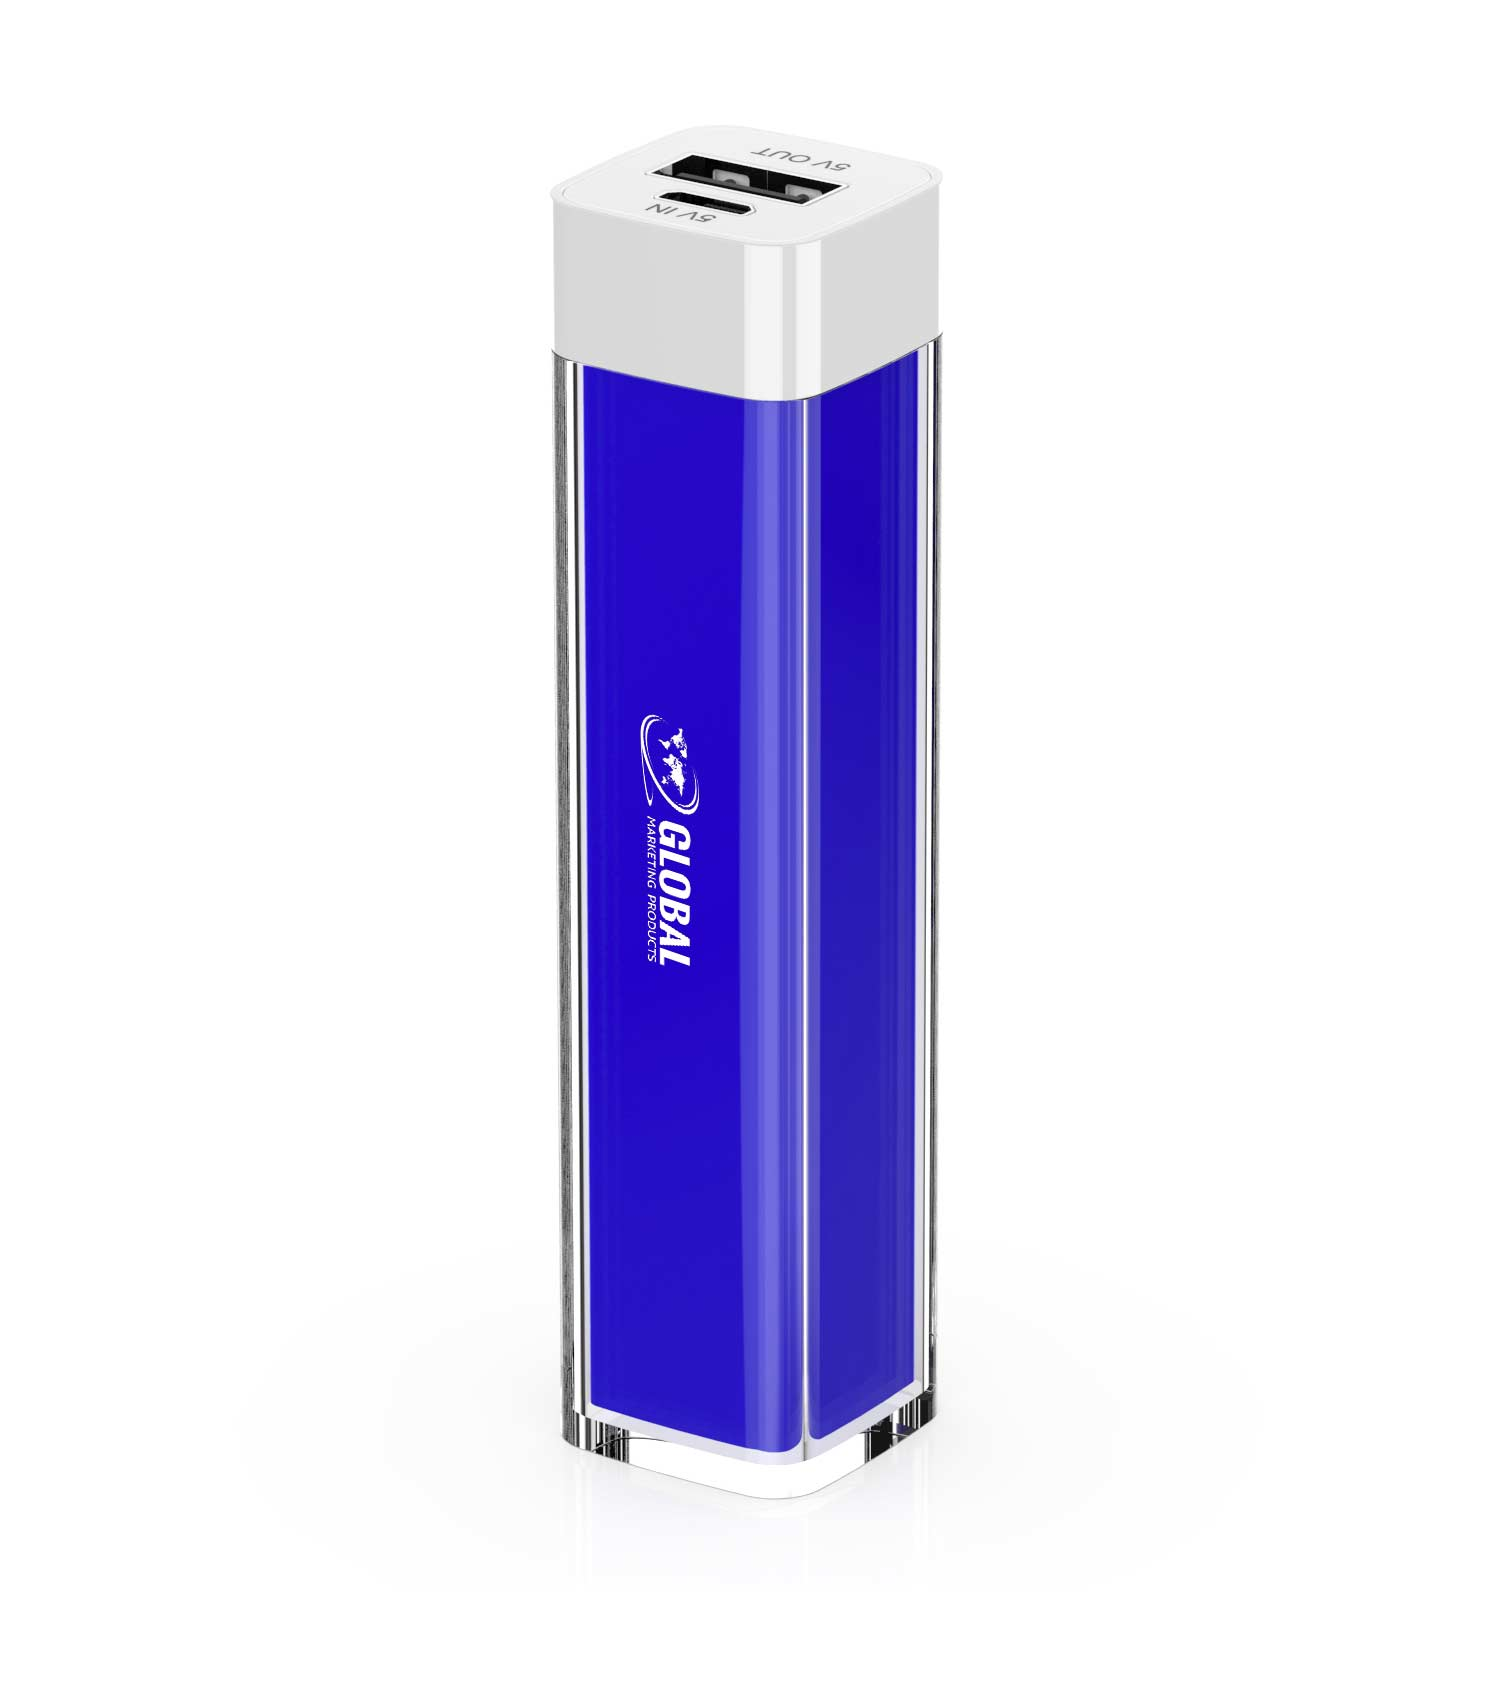 power_bank_1801_blue